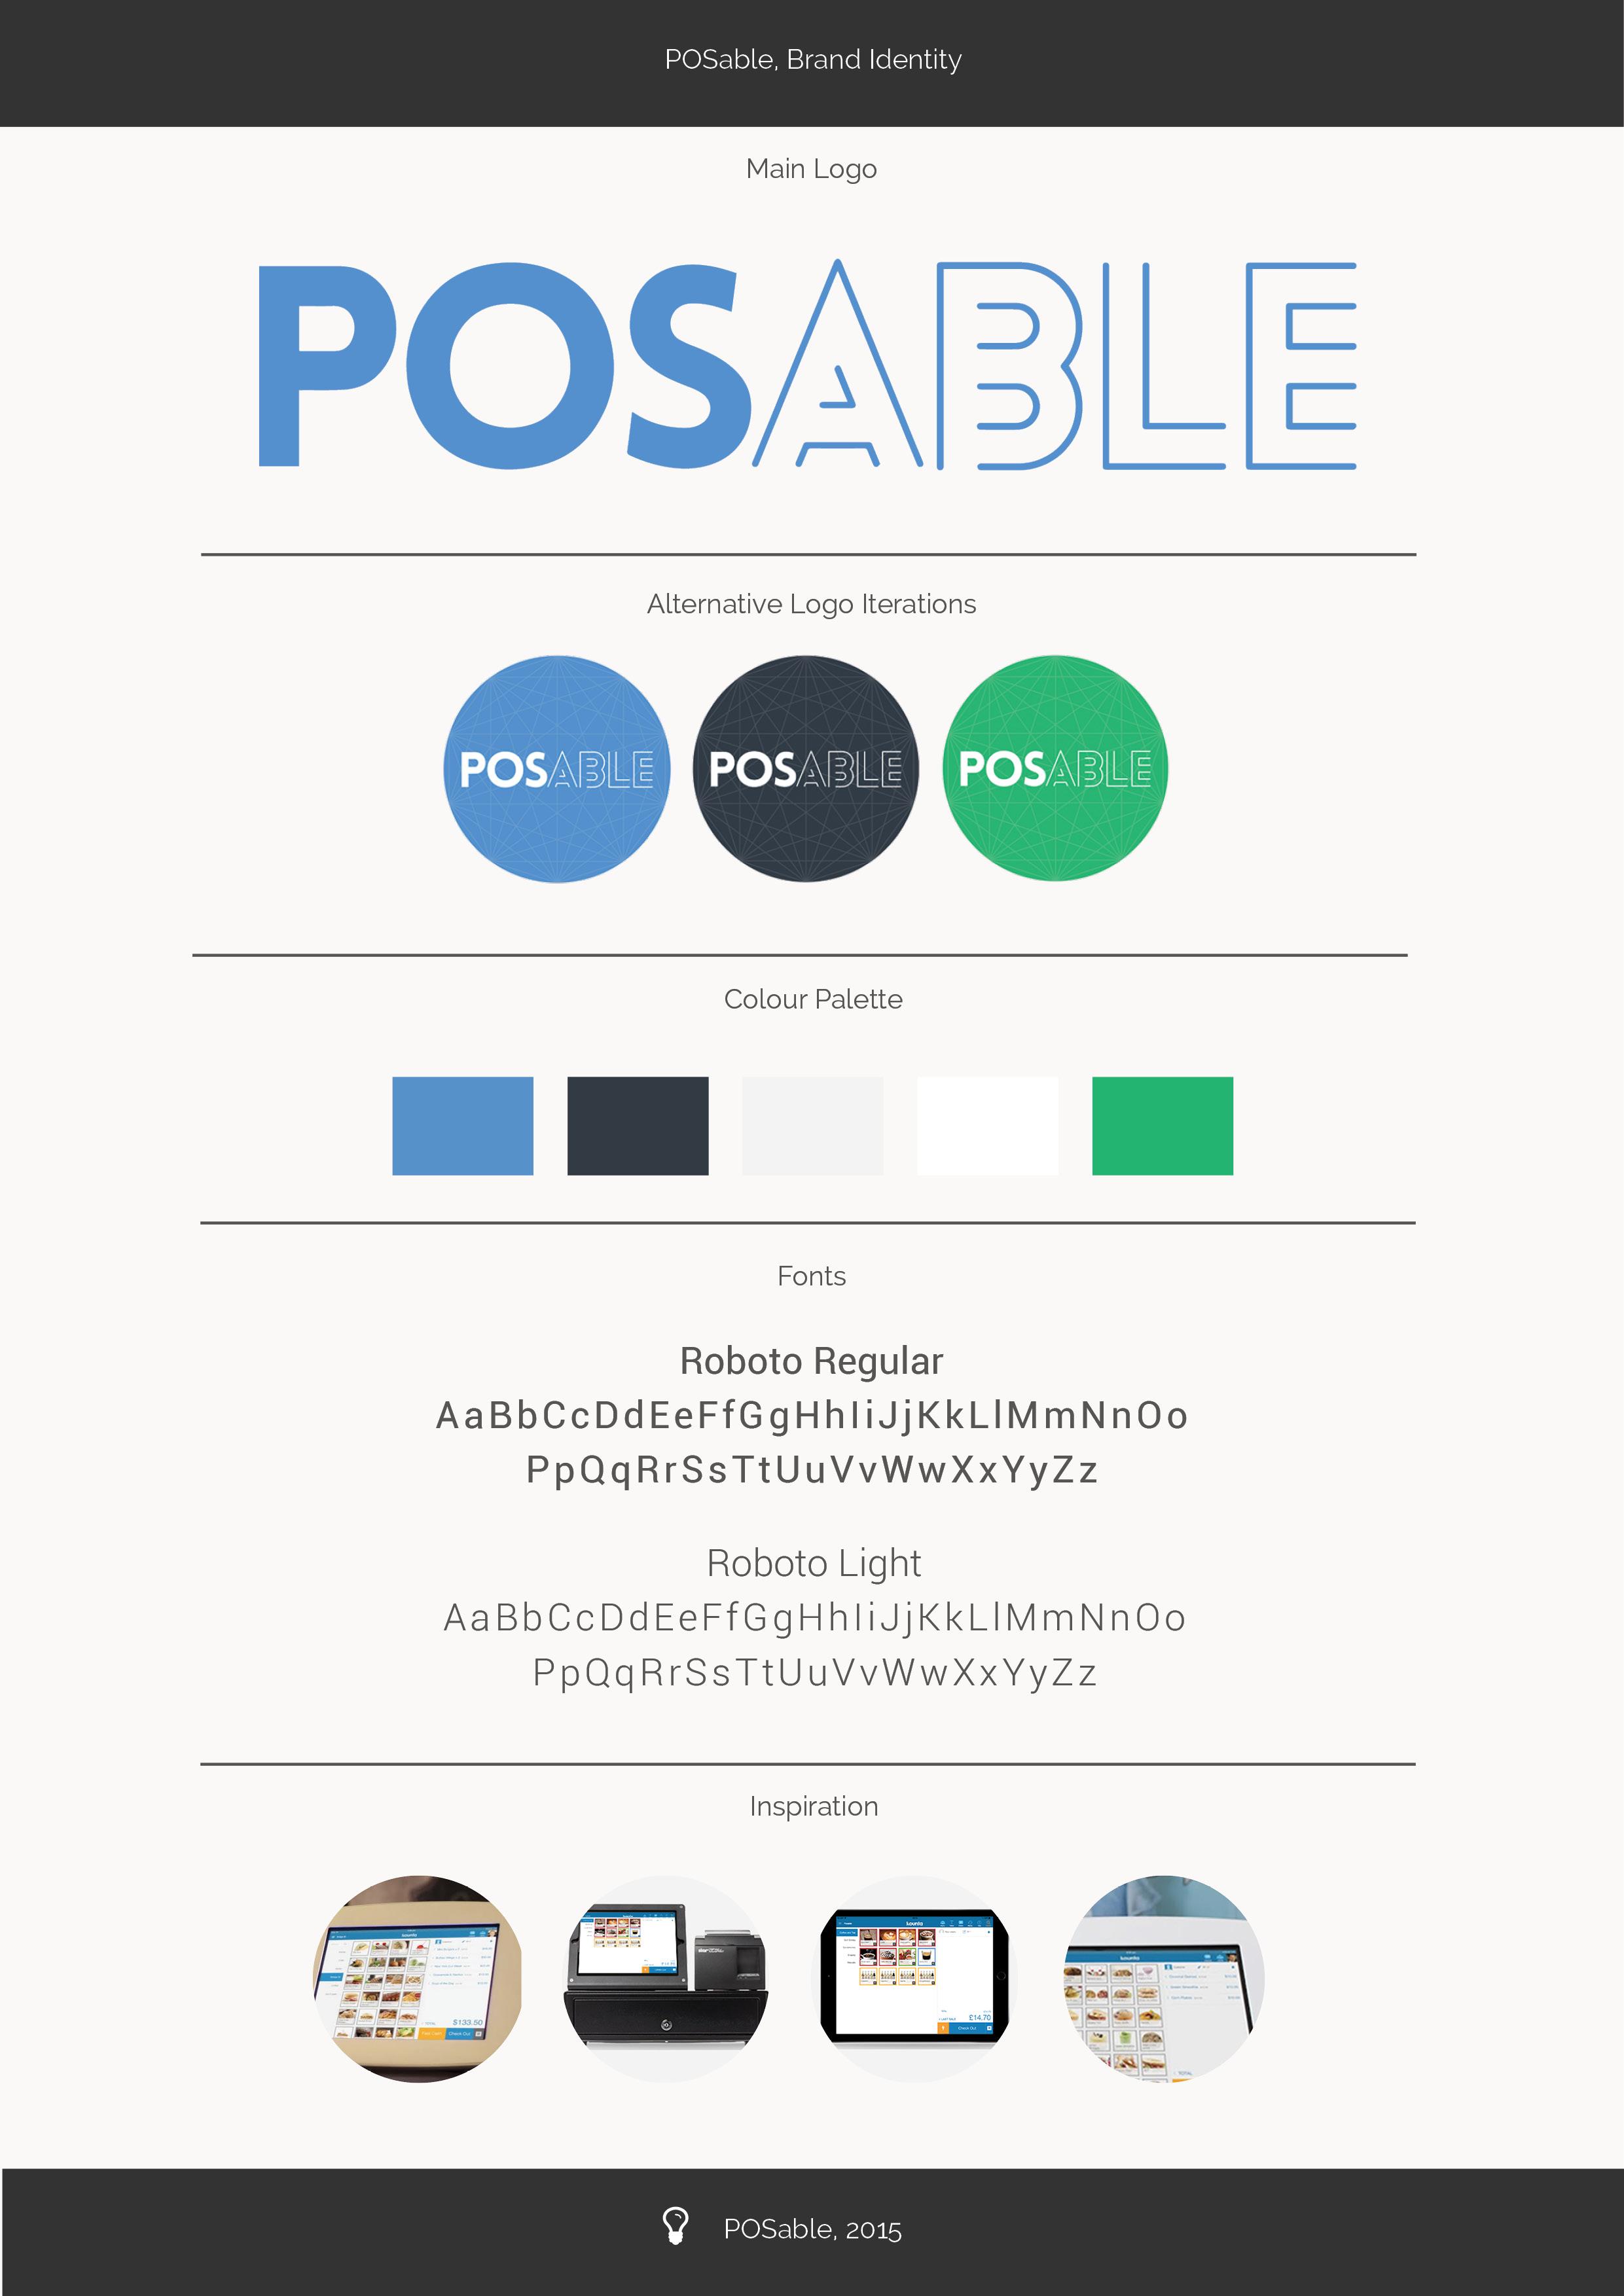 POSable Brand Identity